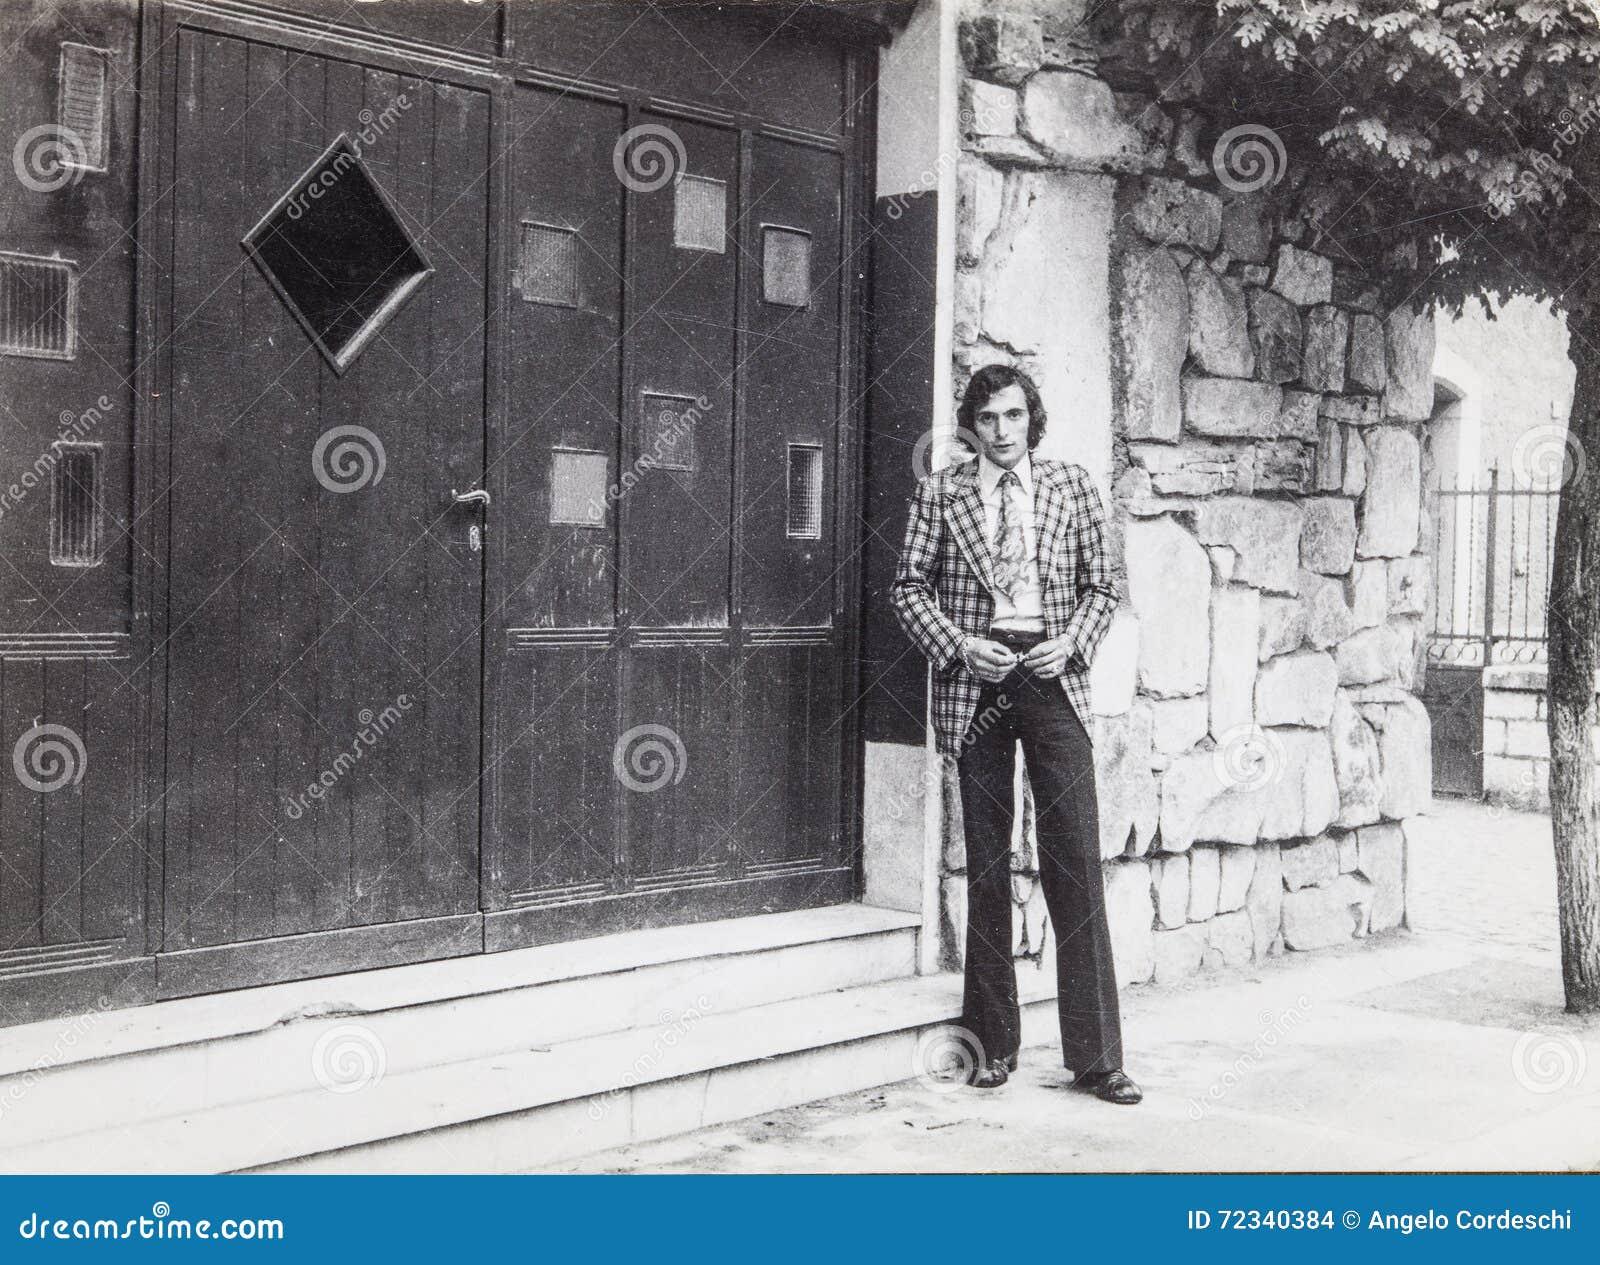 Original vintage photo 60 s of a man outdoors